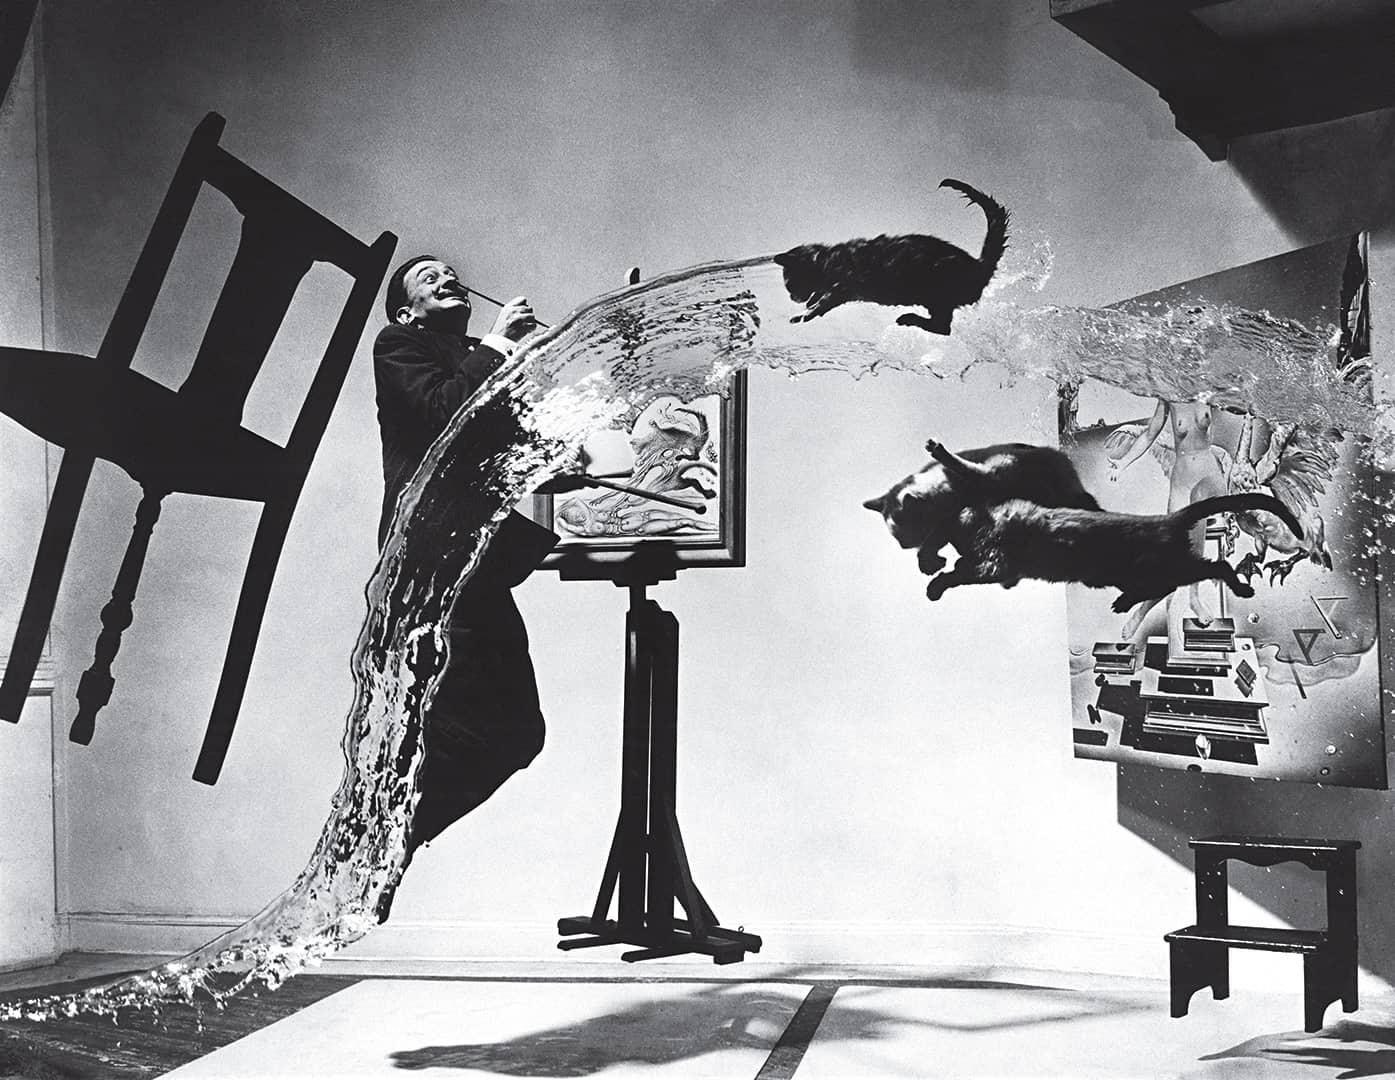 Levitation Photography by Halsman and Salvador Dali